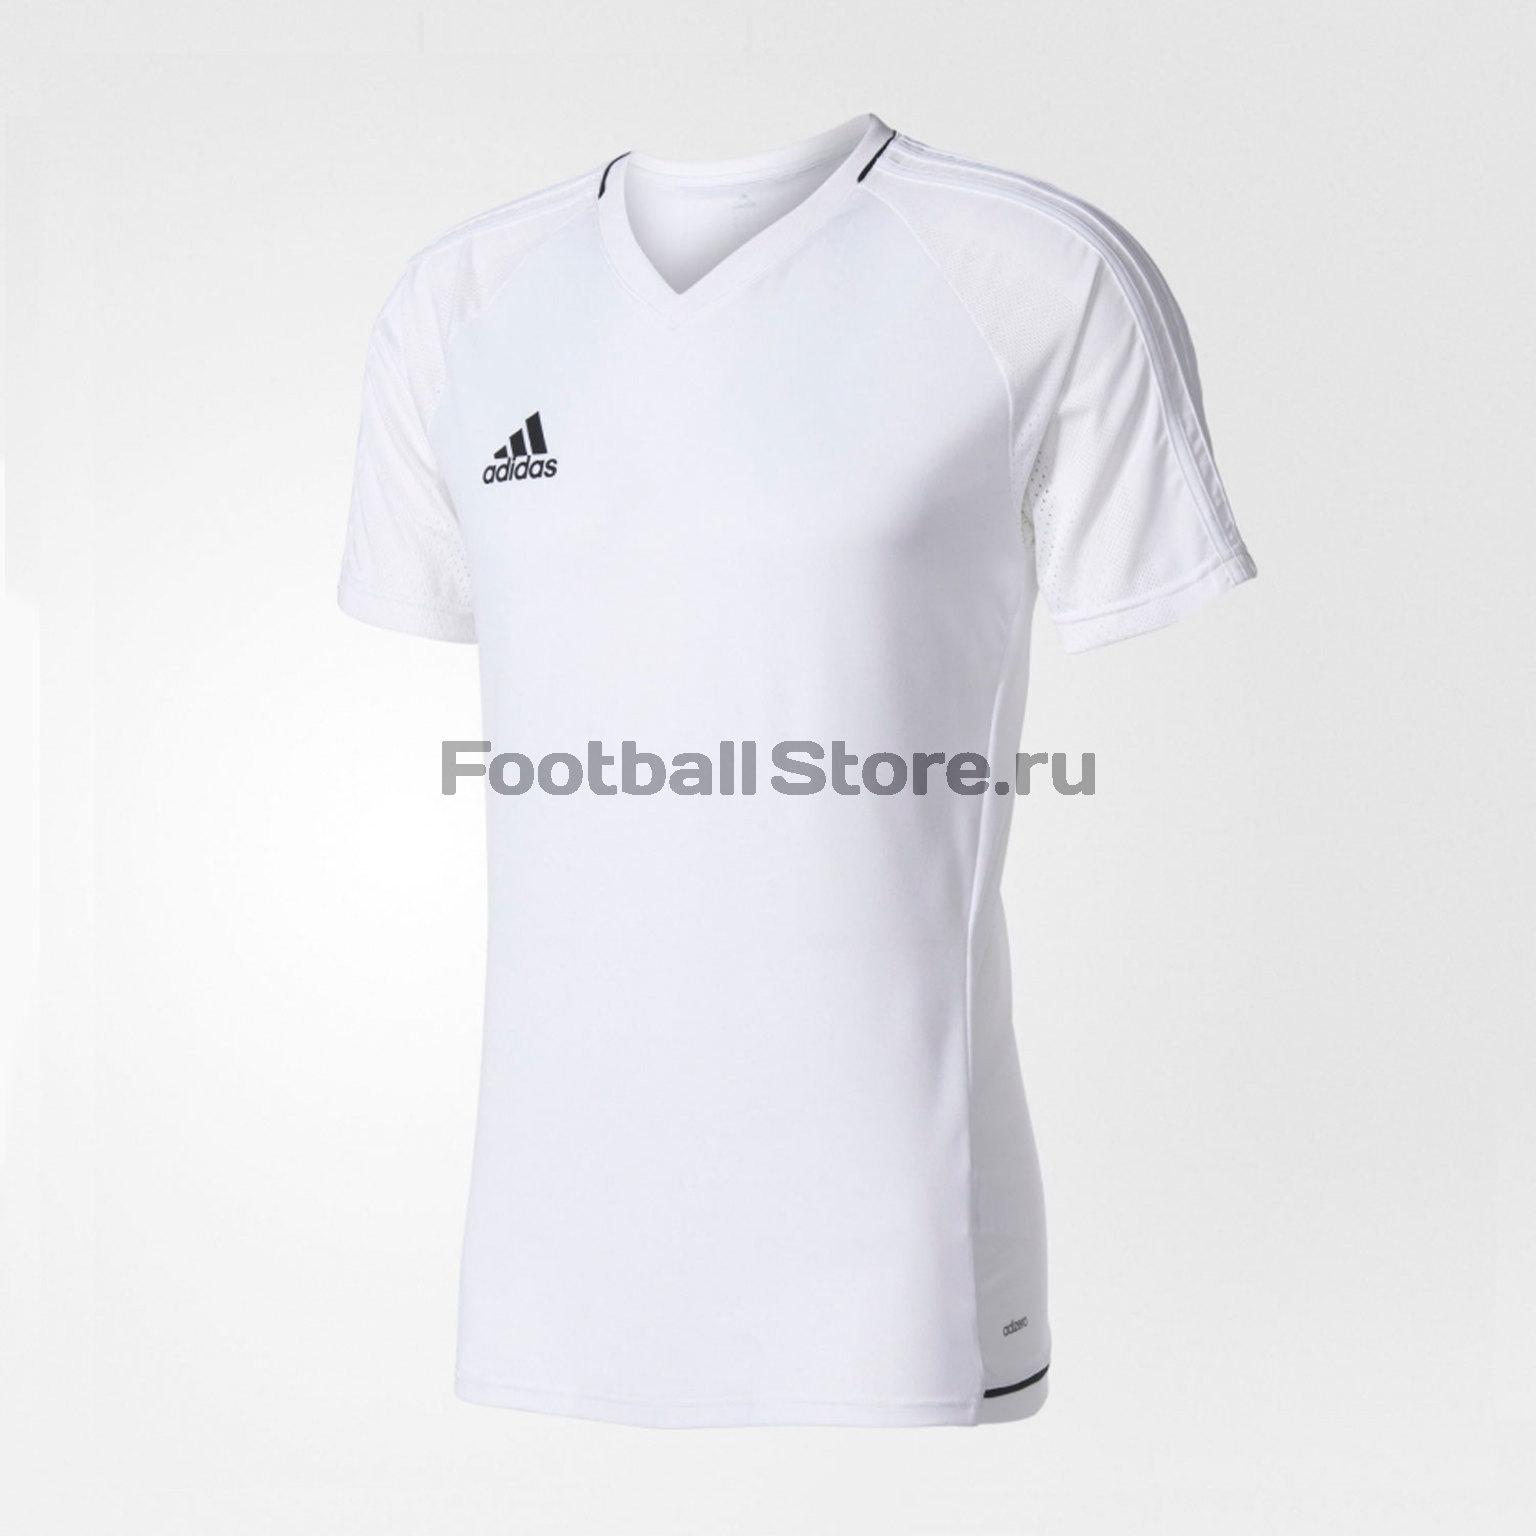 Футболка тренировочная Adidas Tiro17 TRG JSY BQ2801